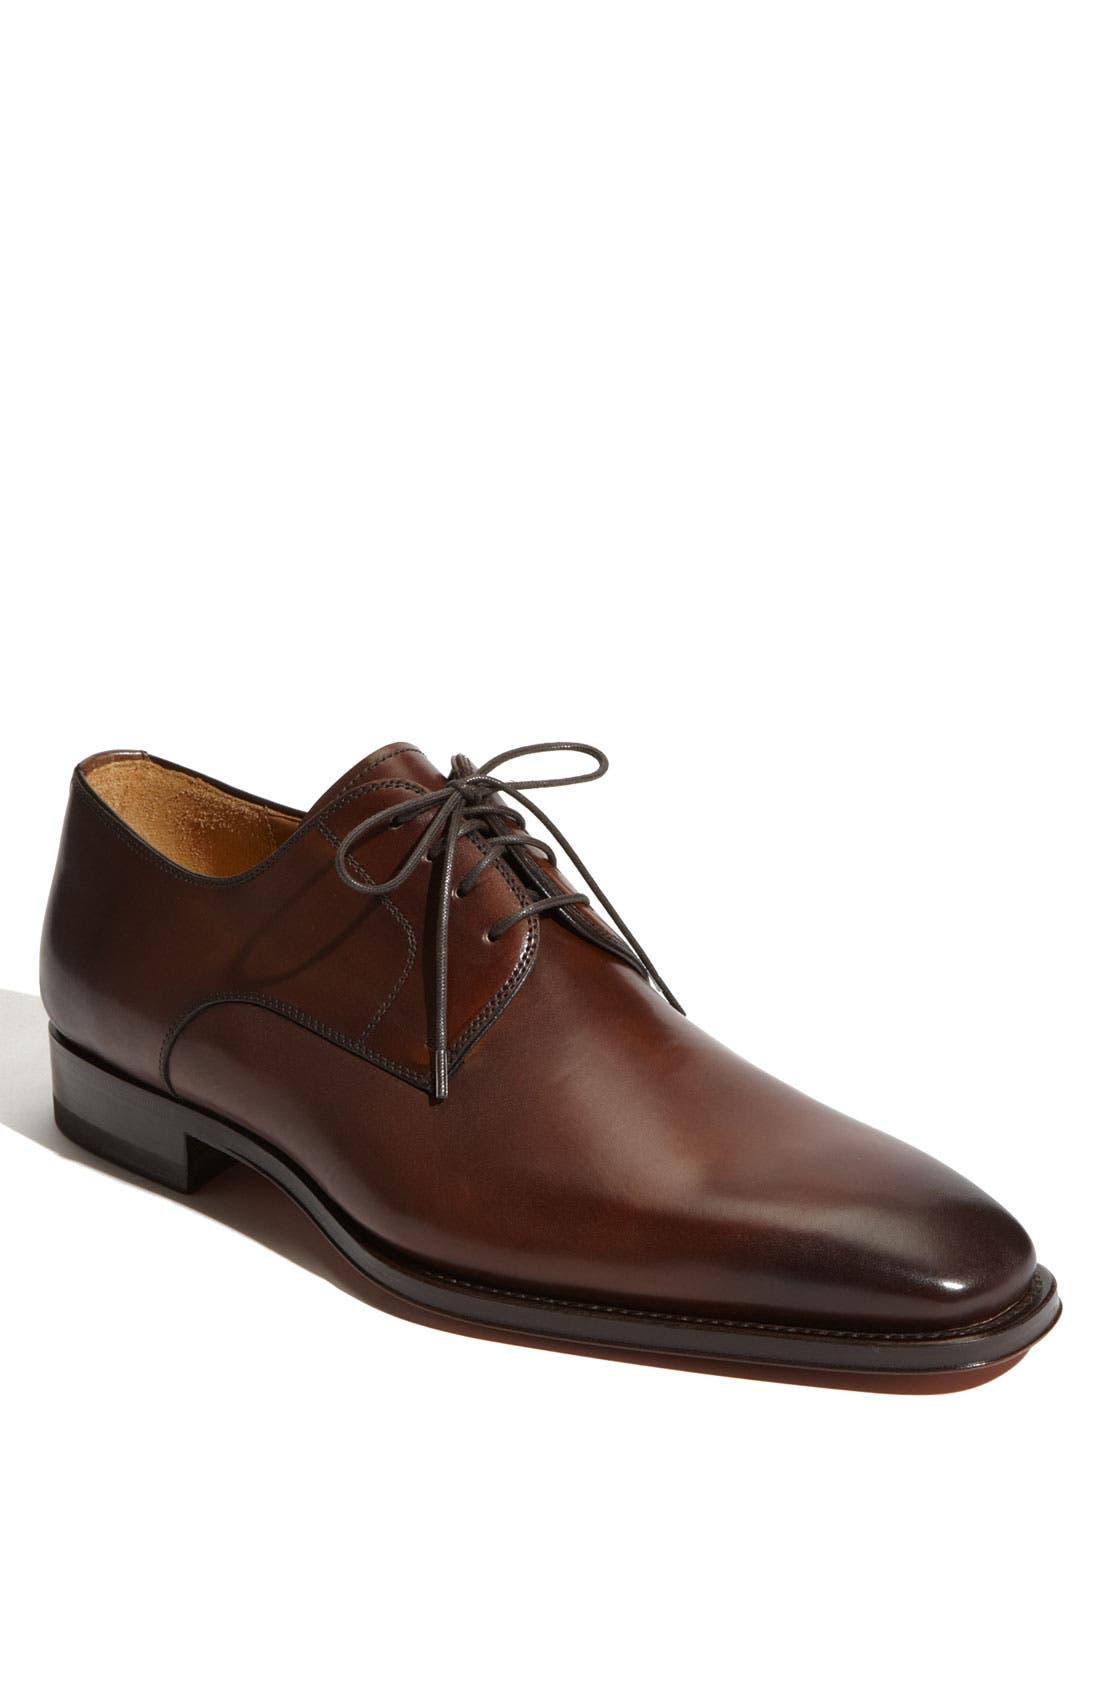 Main Image - Magnanni 'Colo' Plain Toe Derby (Men)